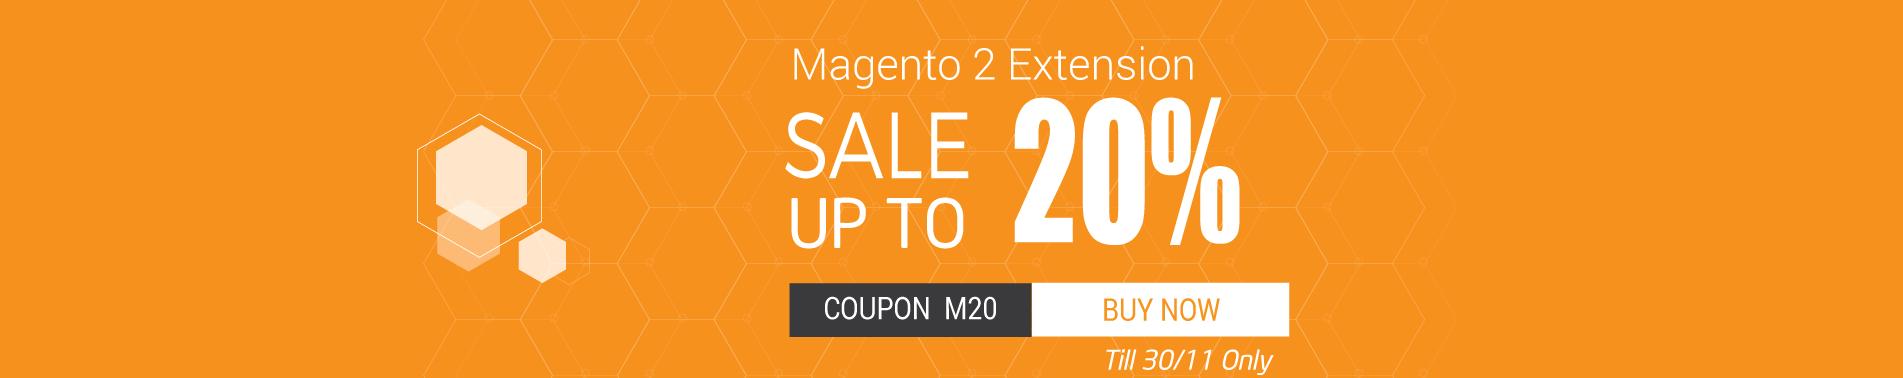 Magento® 2